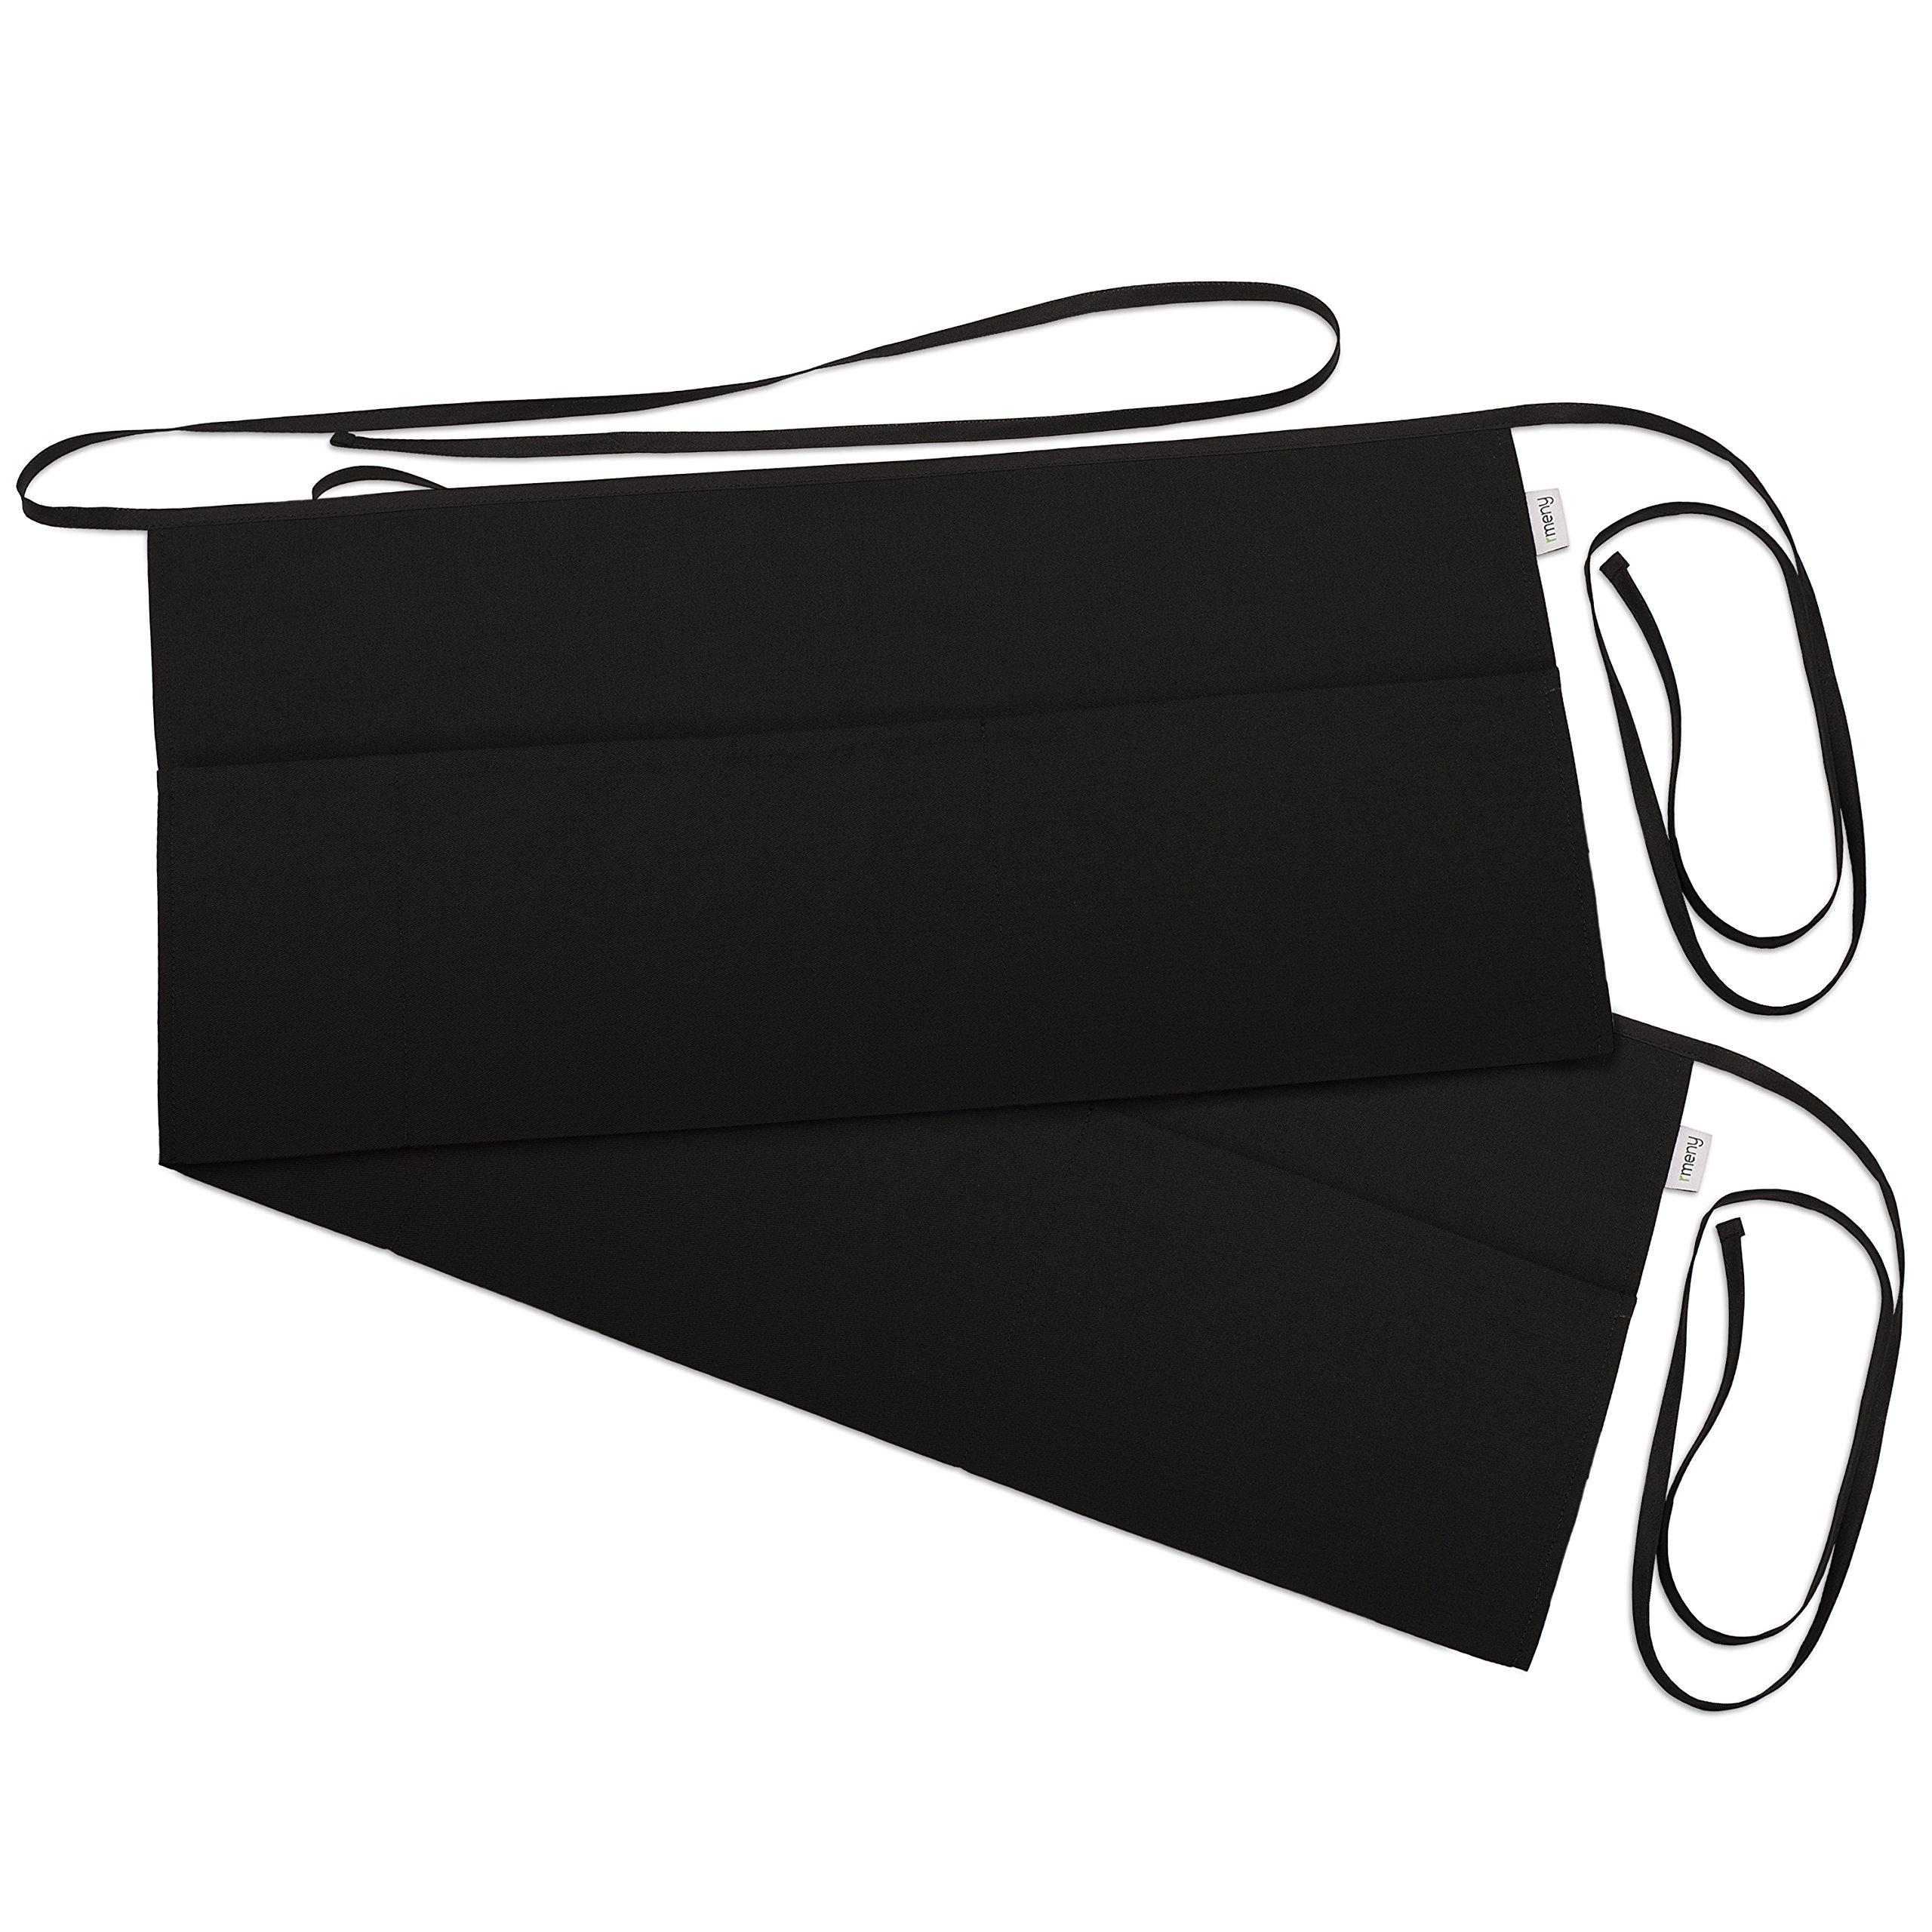 3 Pockets Waist Apron (Pack of 2) - Waitresses apron, Kitchen apron, Black apron - by Rmeny (Black)